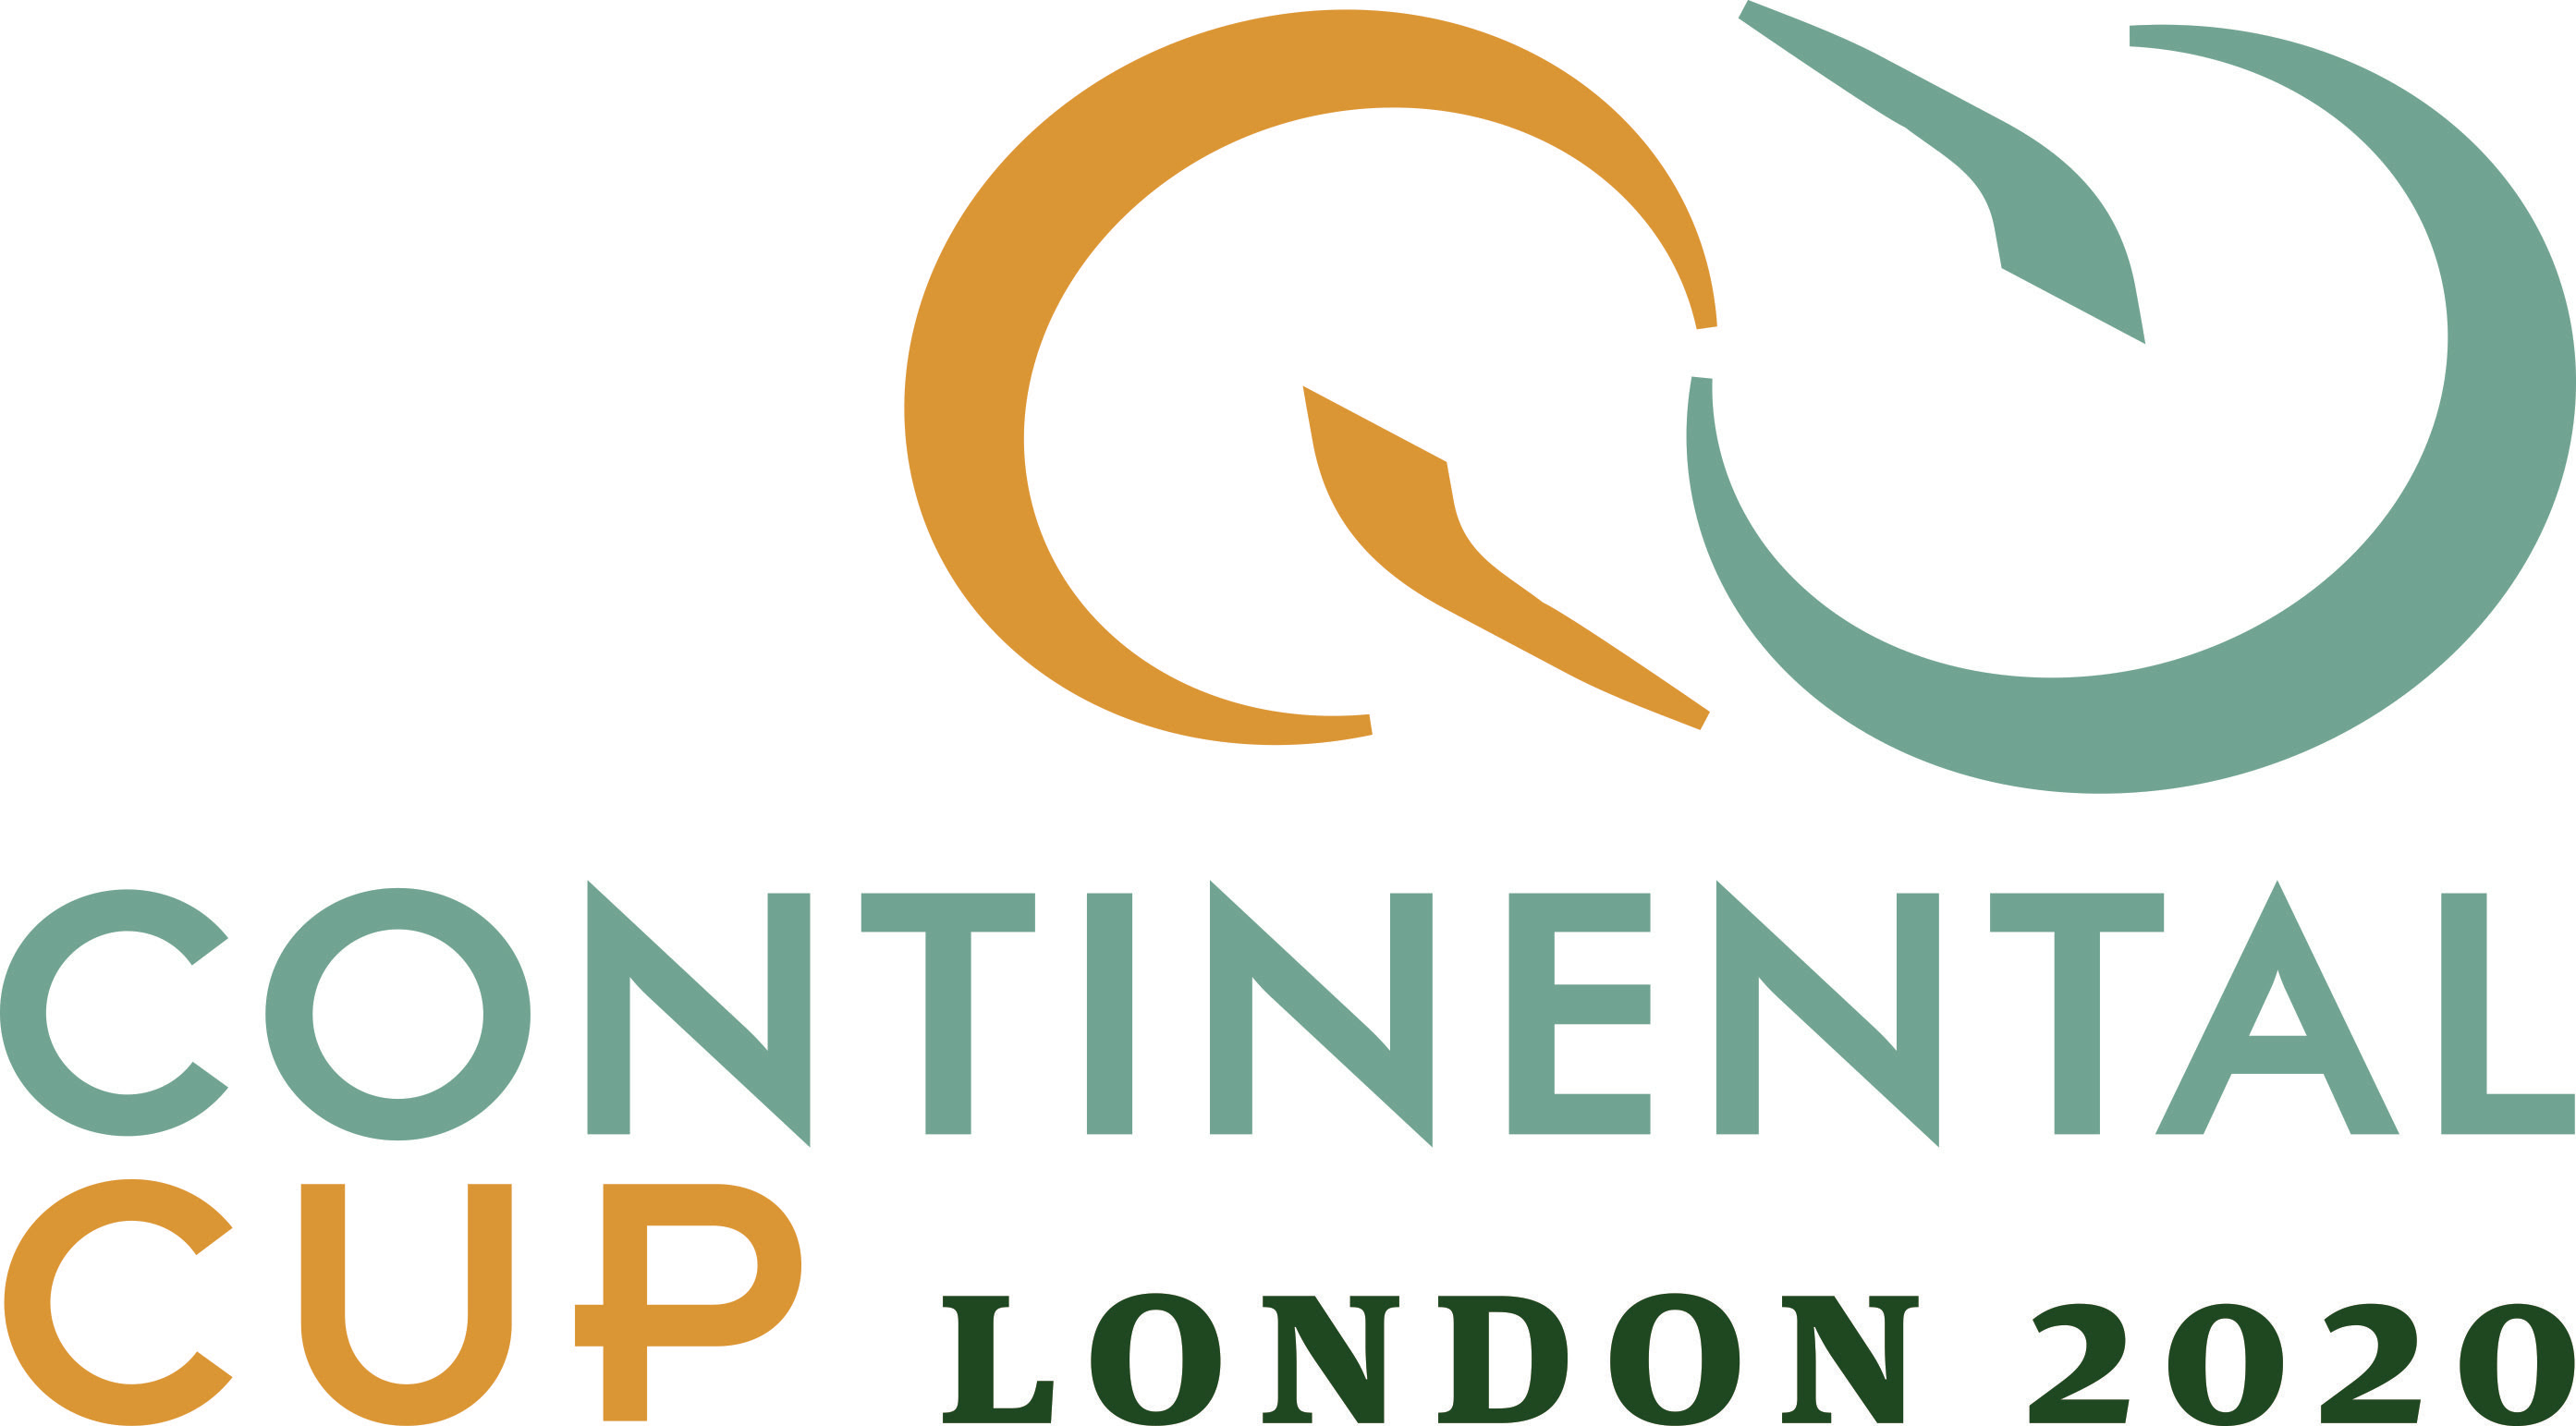 Continental Cup 2020 - Europa gegen Nordamerika